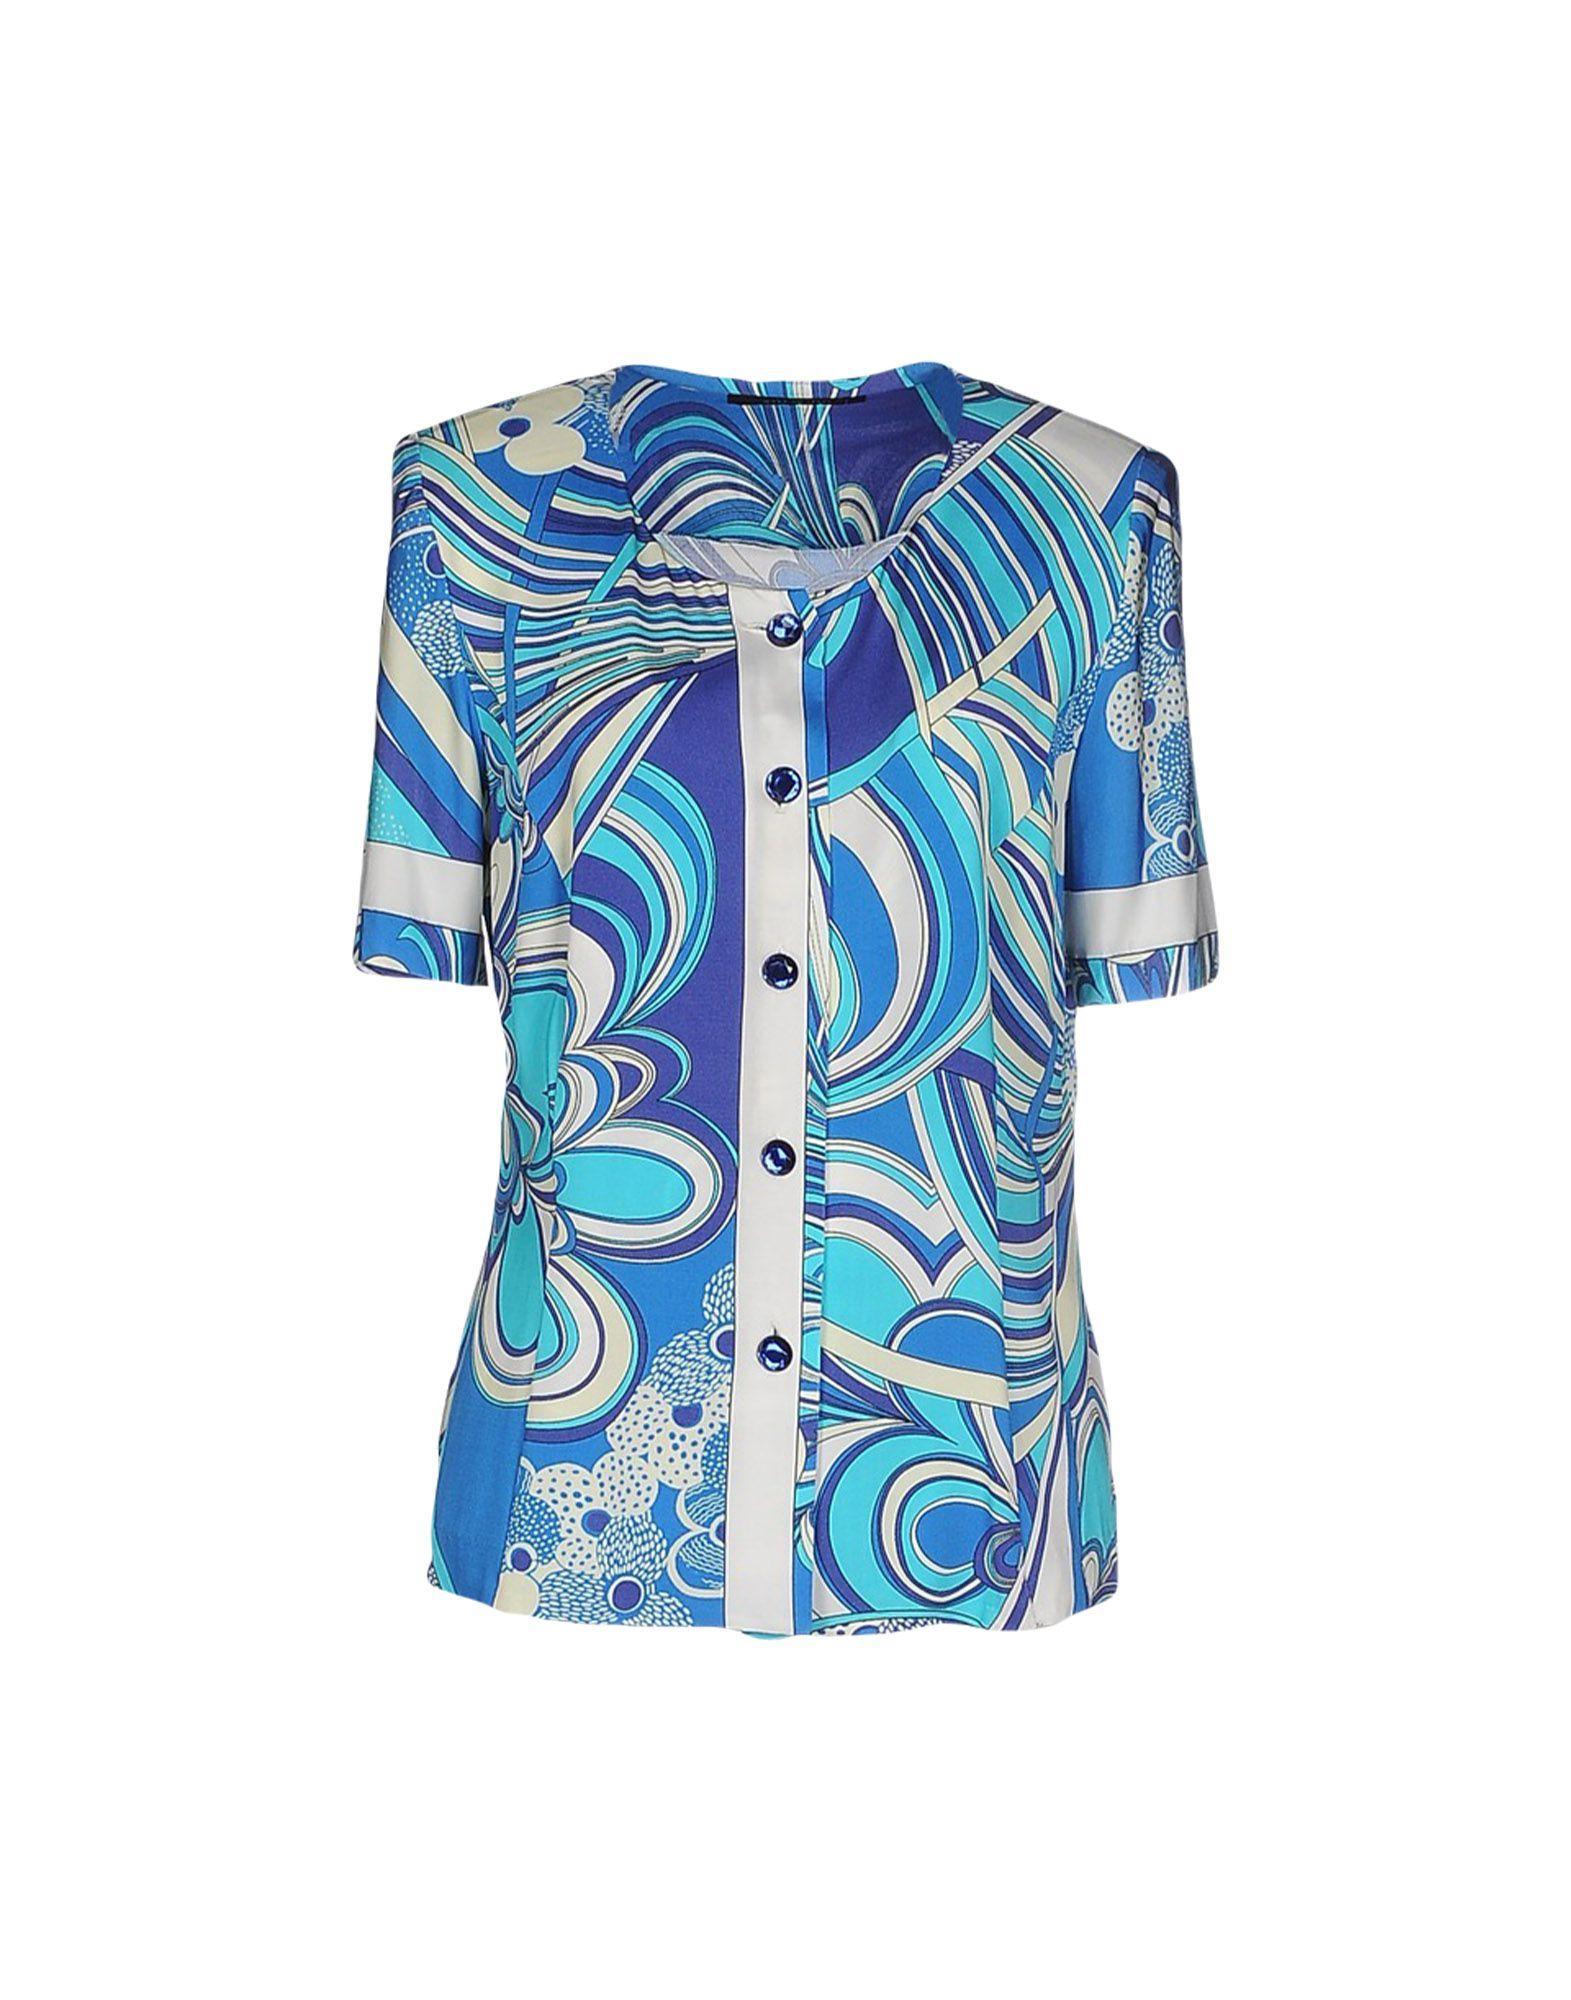 DOMINA Damen Strickjacke Farbe Azurblau Größe 5